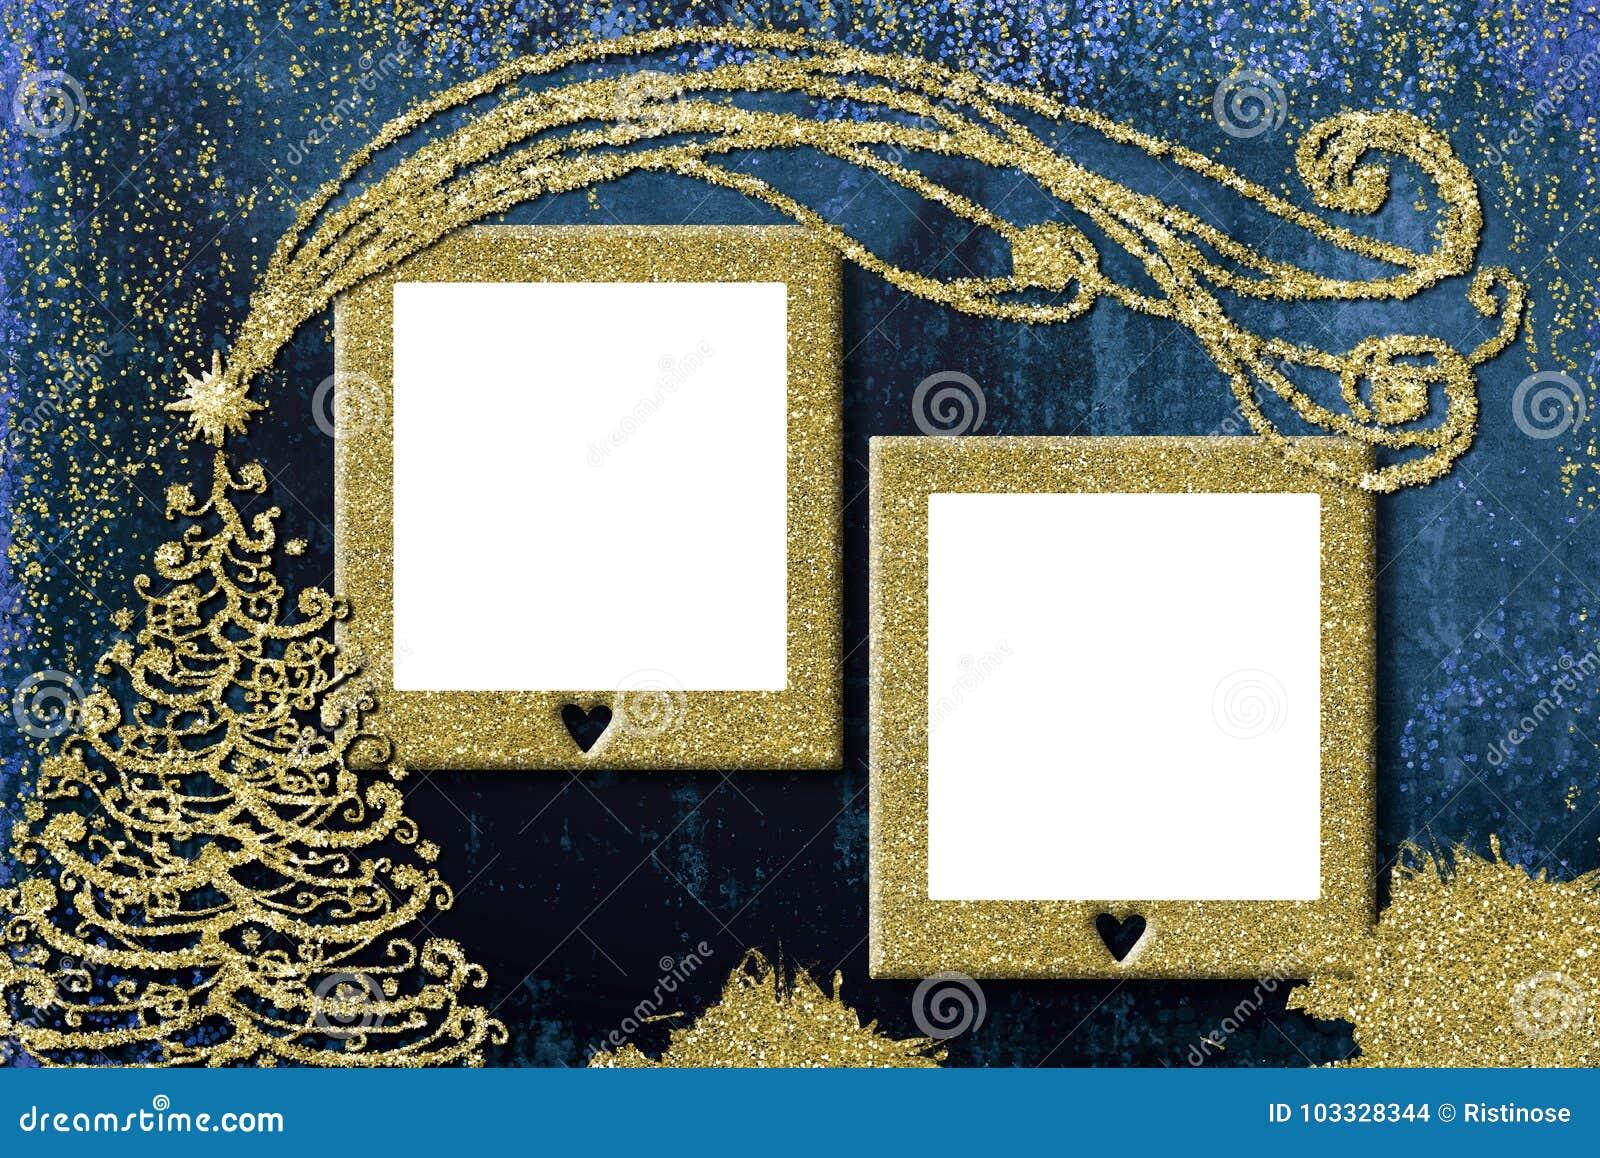 Christmas 2 Photo Frames Cards. Stock Photo - Image of blank, kids ...